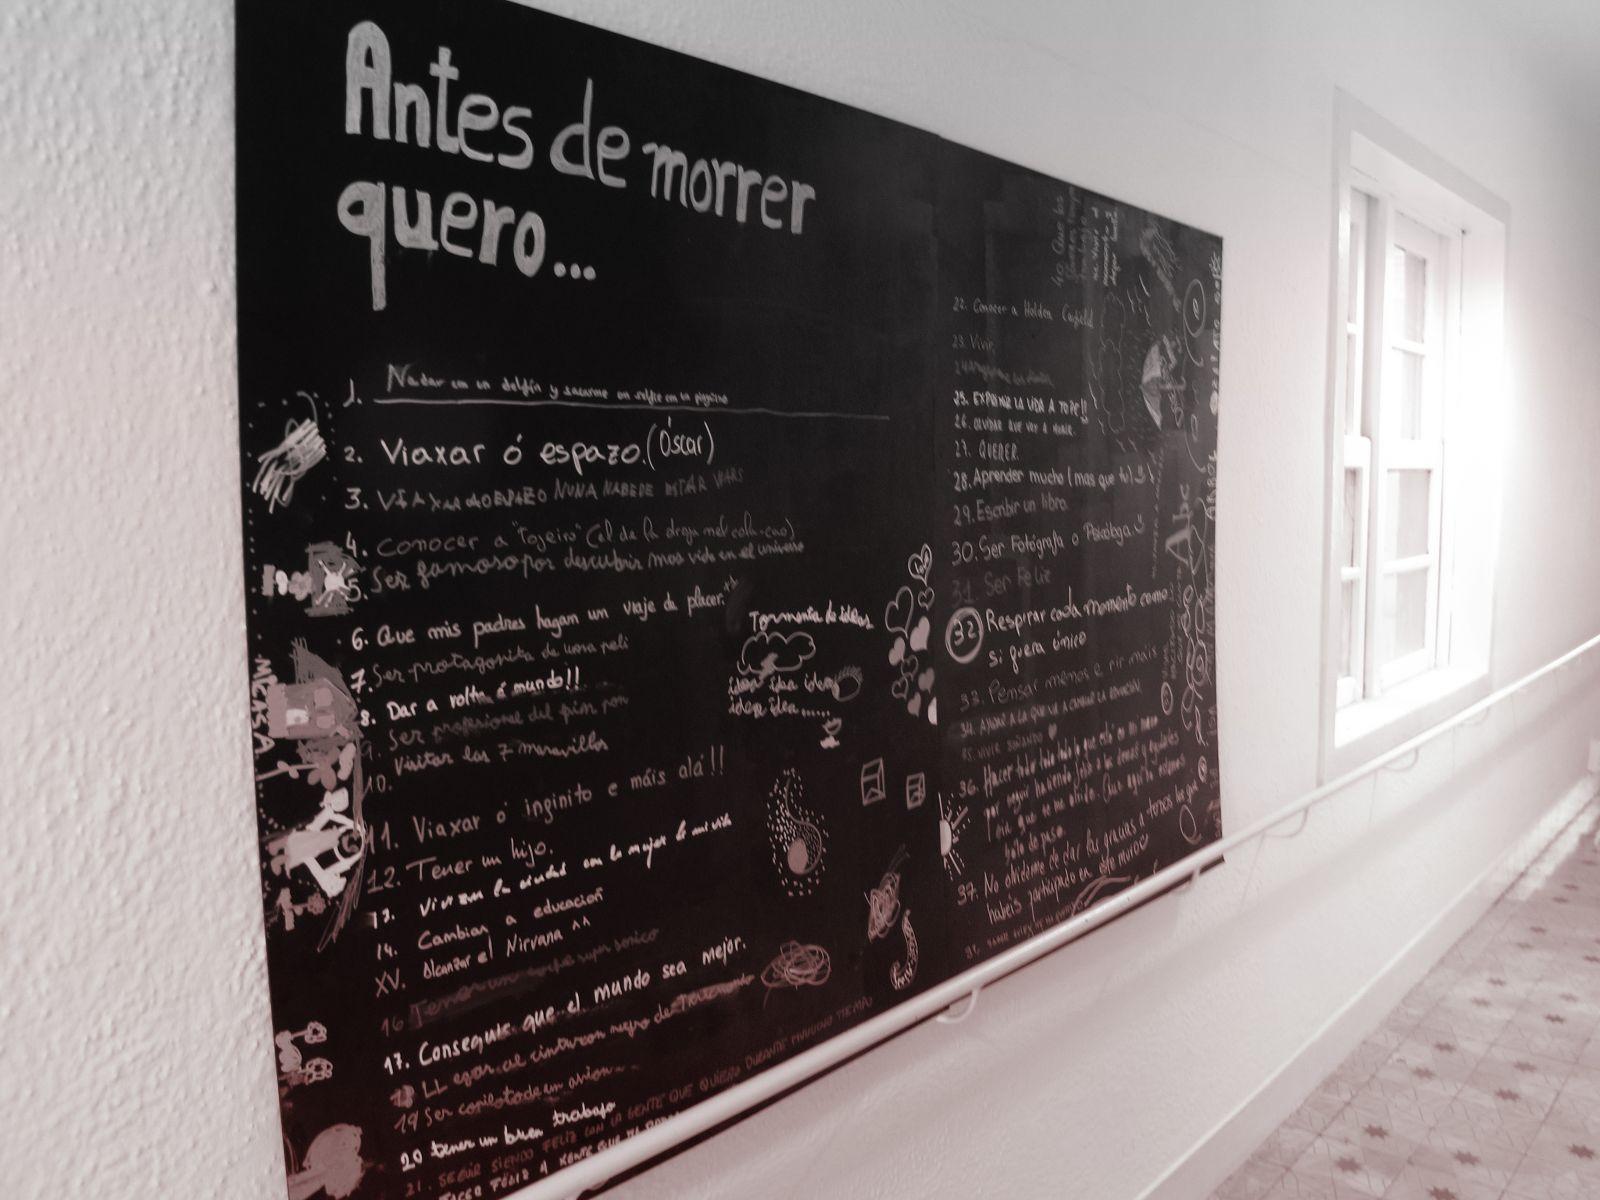 Espacio Arroelo, Pontevedra